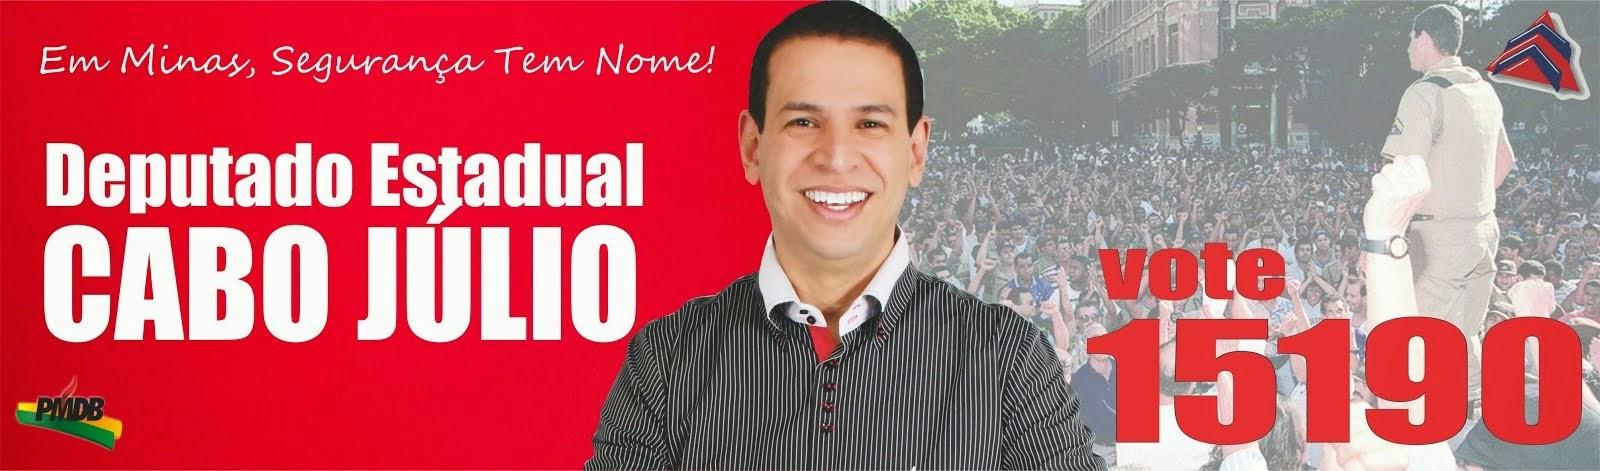 VOTE 15190 DEPUTADO ESTADUAL CABO JULIO